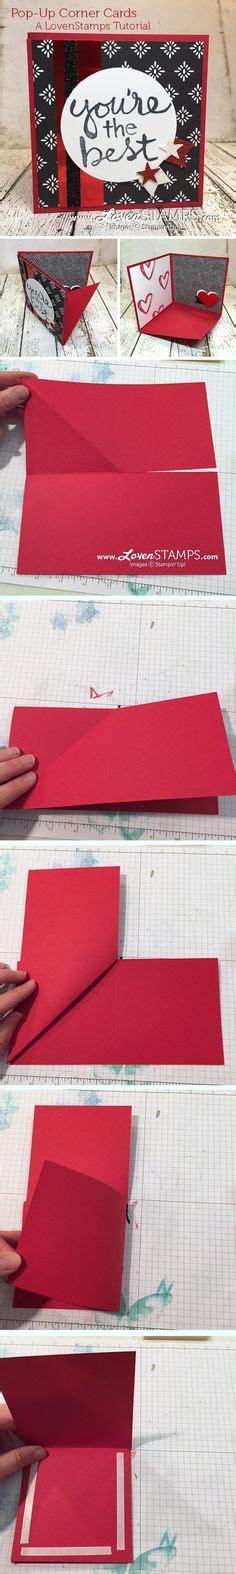 tutorial carding mailer super simple grad card seen on pinterest by cards4joy